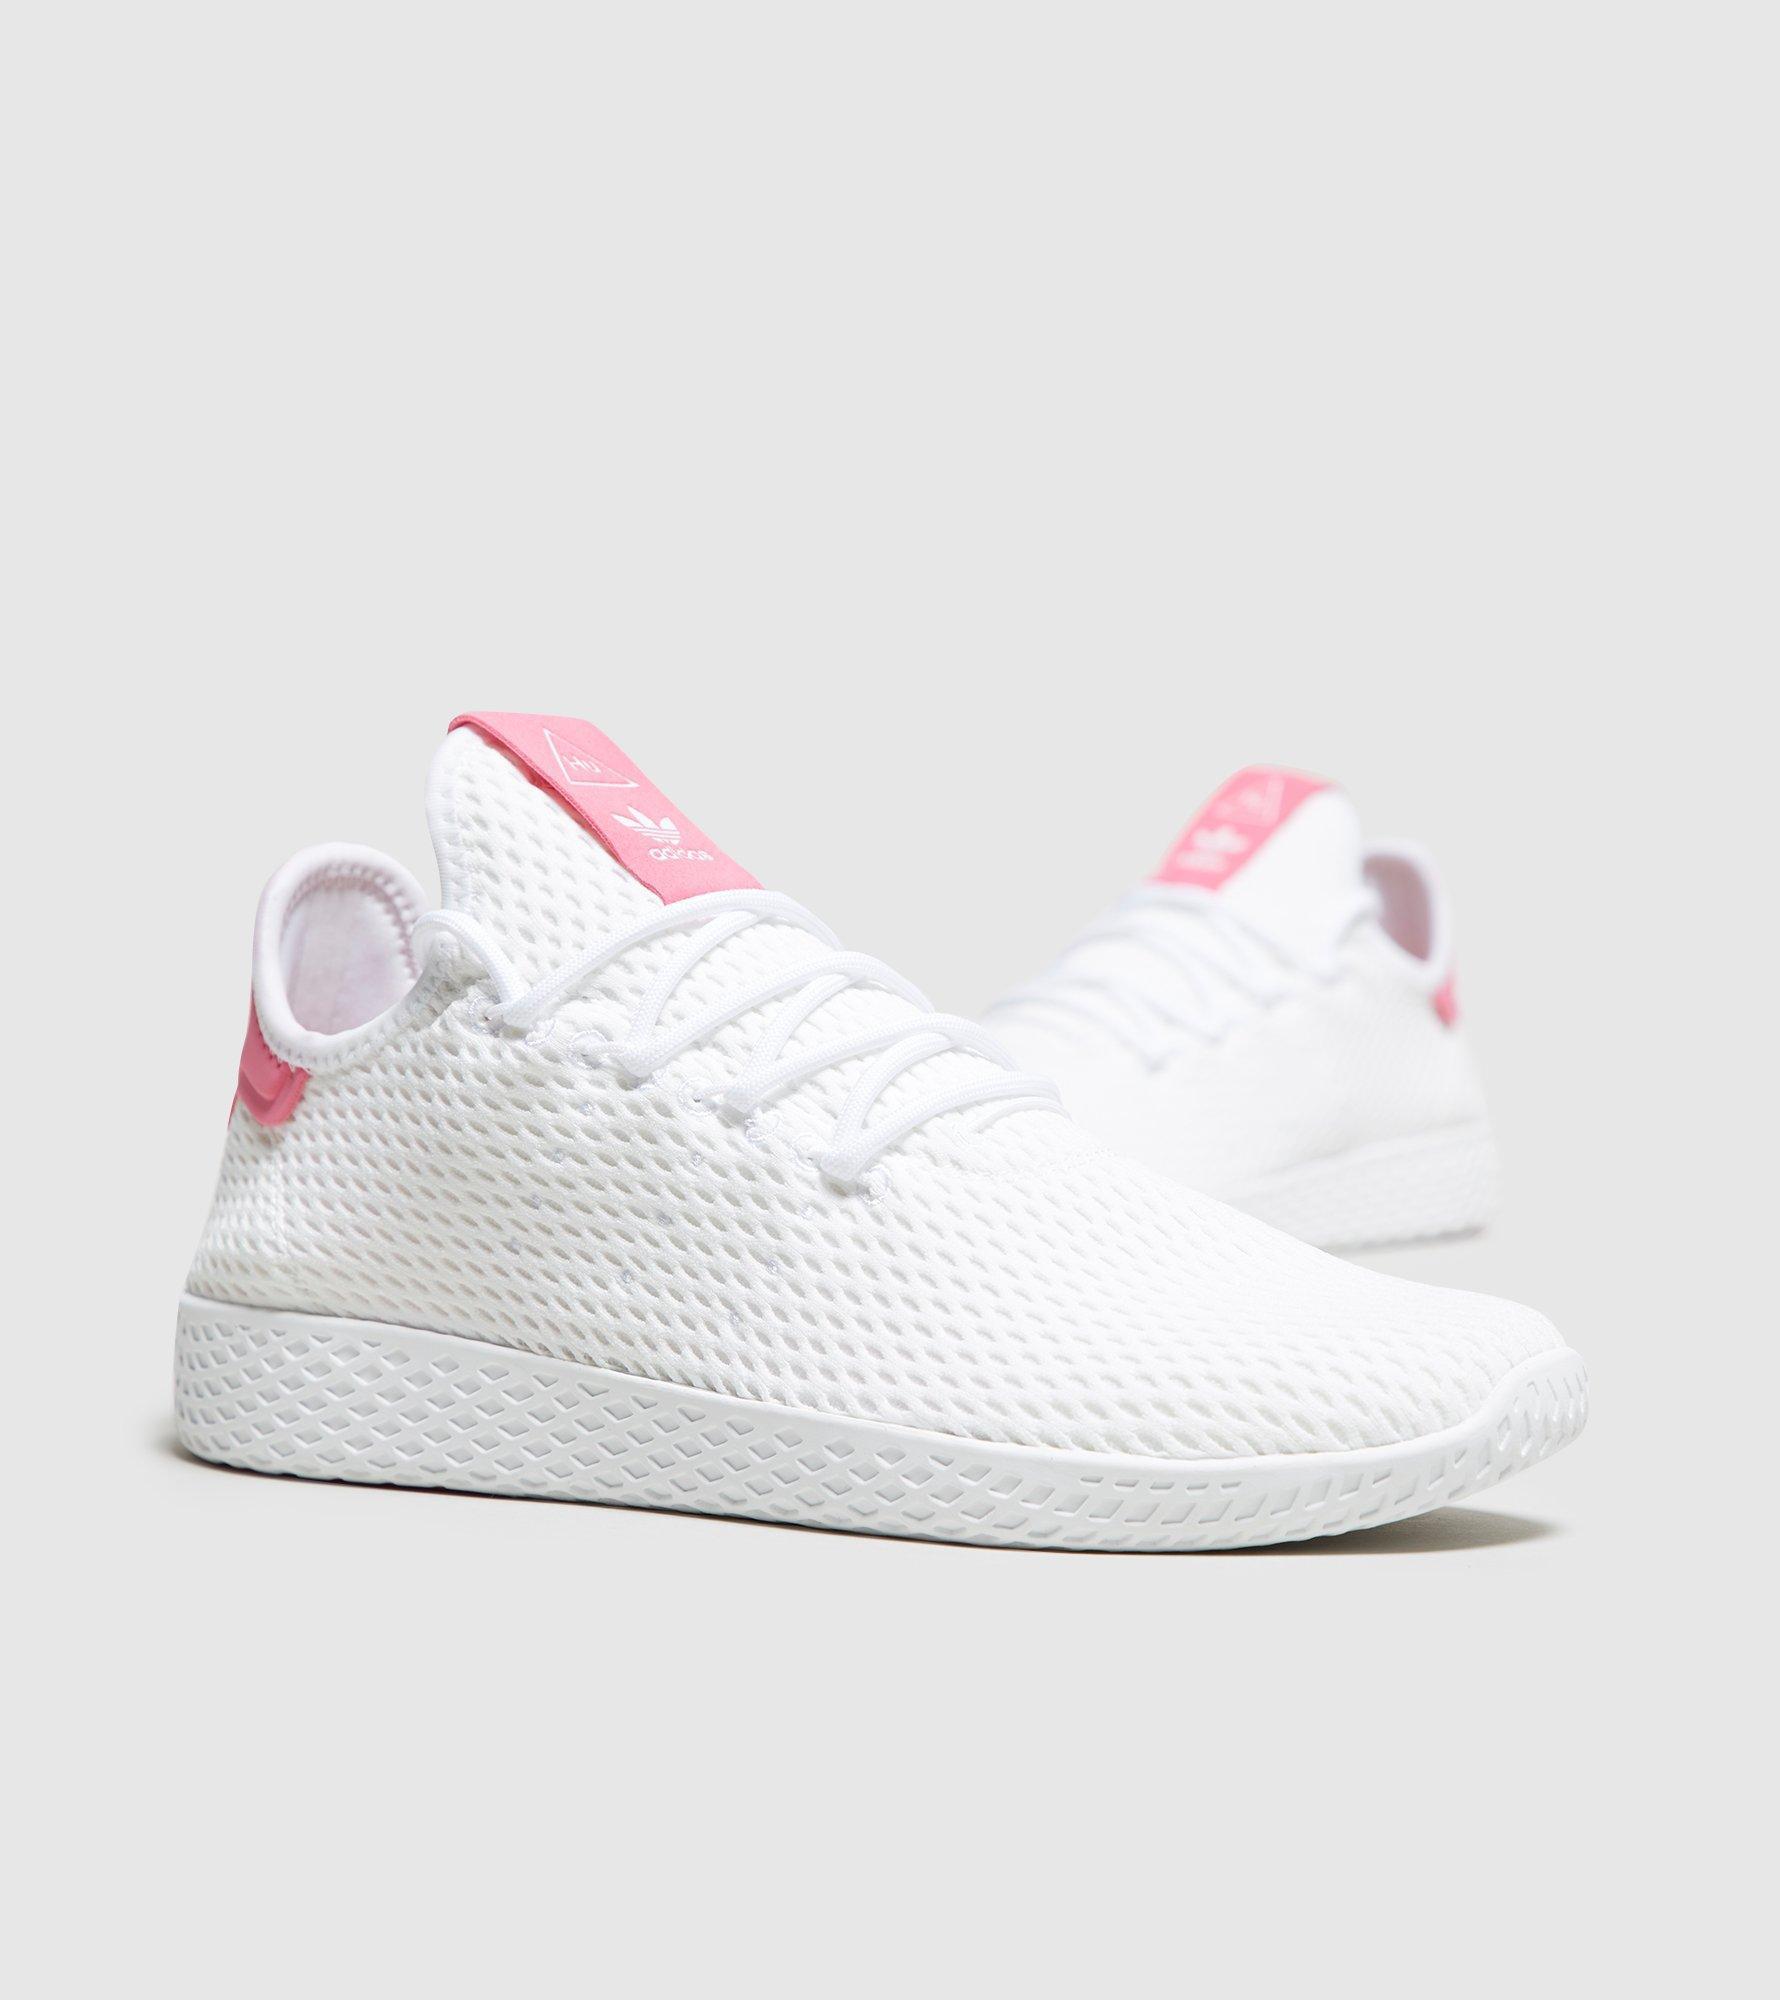 newest d4f2a a496c Lyst - adidas Originals Pharrell Williams Tennis Hu in White